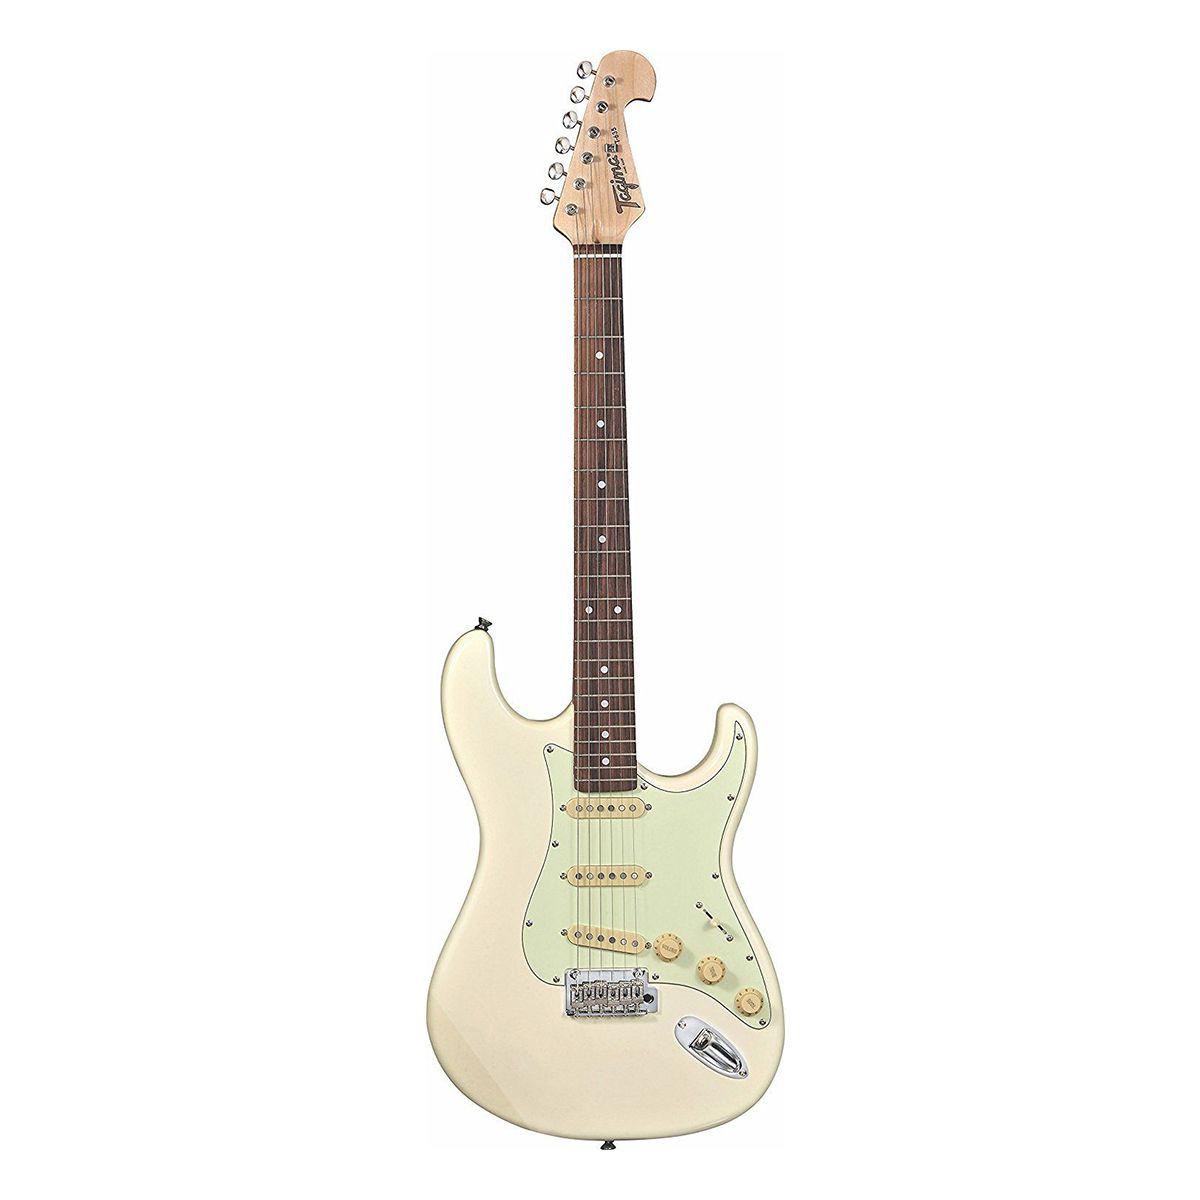 Guitarra Tagima T635 Classic Rosewood White com Mintgreen